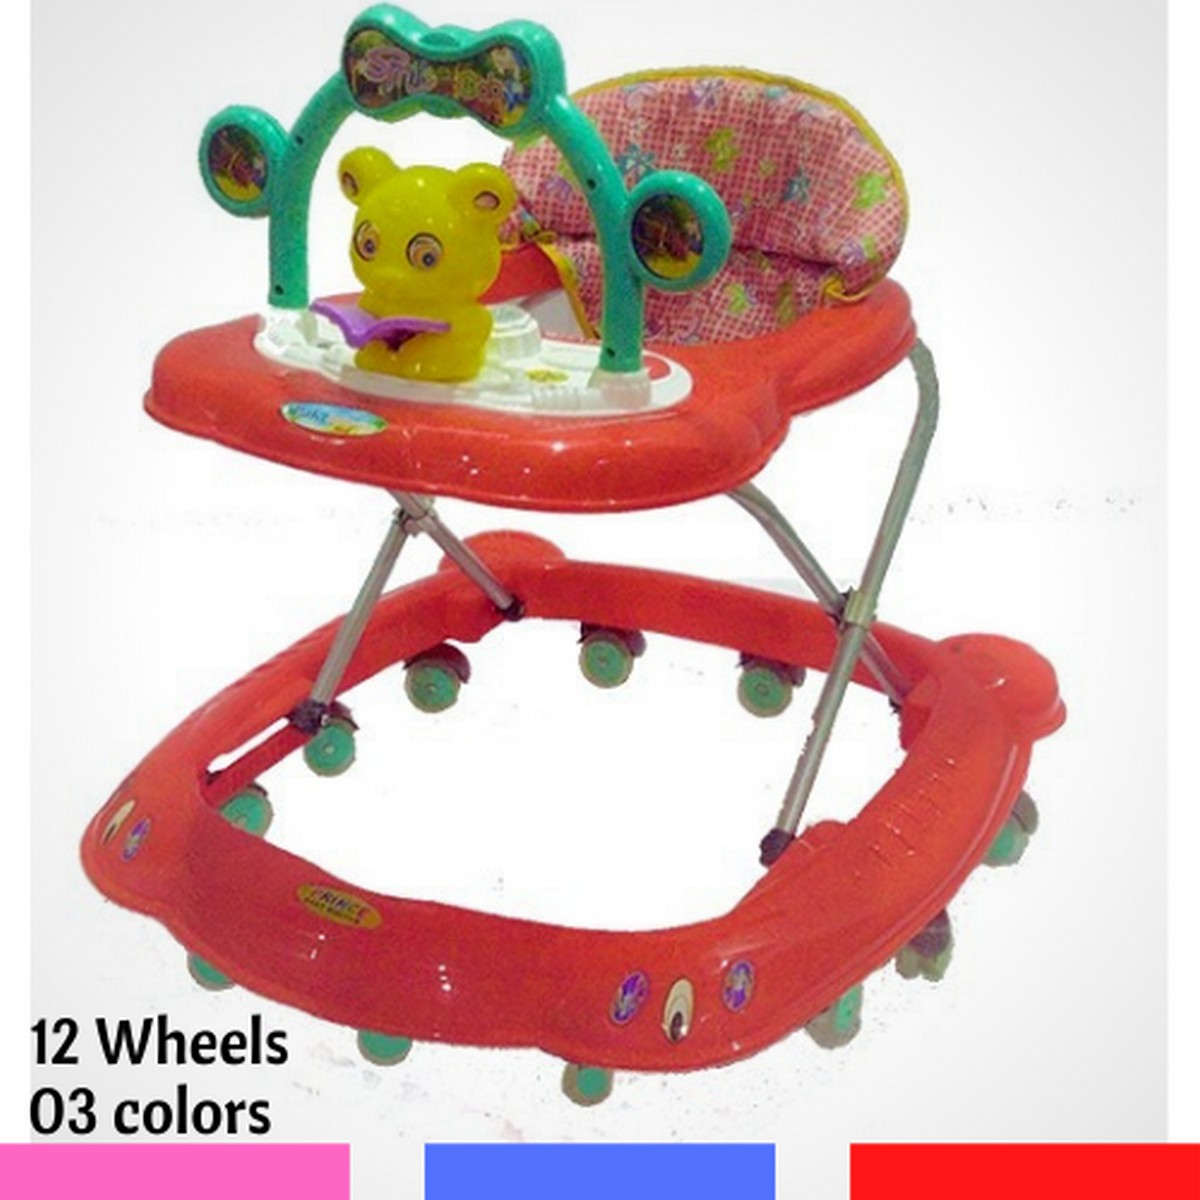 12 Wheel Music Tray Baby Walker   Baby Walkar for new born    Kids Wakar for toodlers   Baby waker for girls and boys